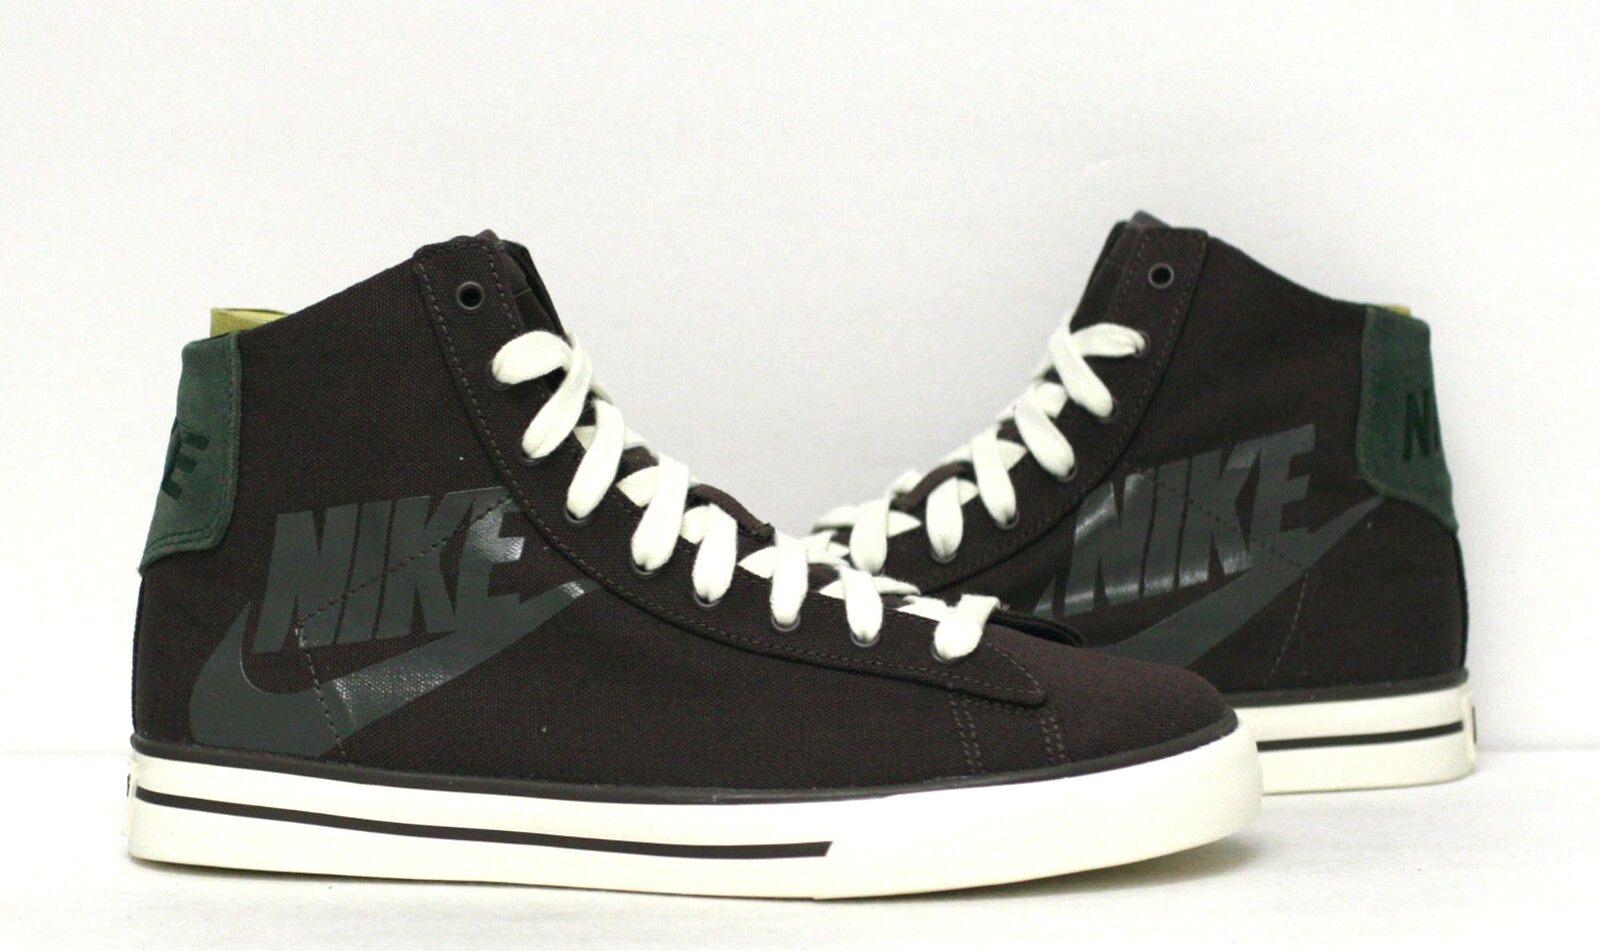 Nike Men's shoes Sweet Classic High Canvas shoes 386116-221 Men Size 6.5 & 7